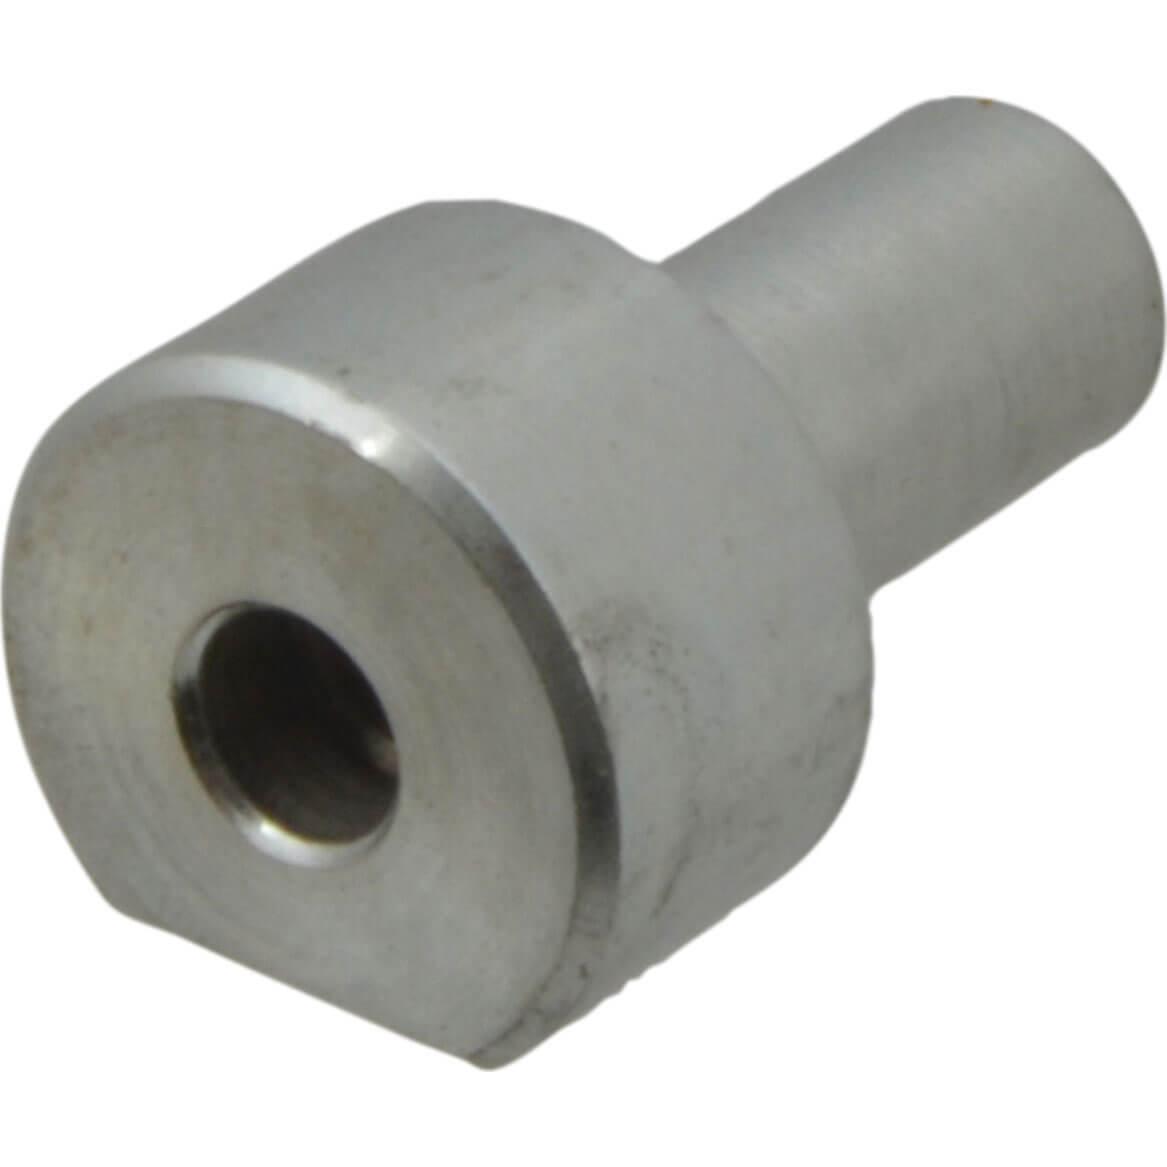 Image of Monument Radiator Drain Cock Key 7mm